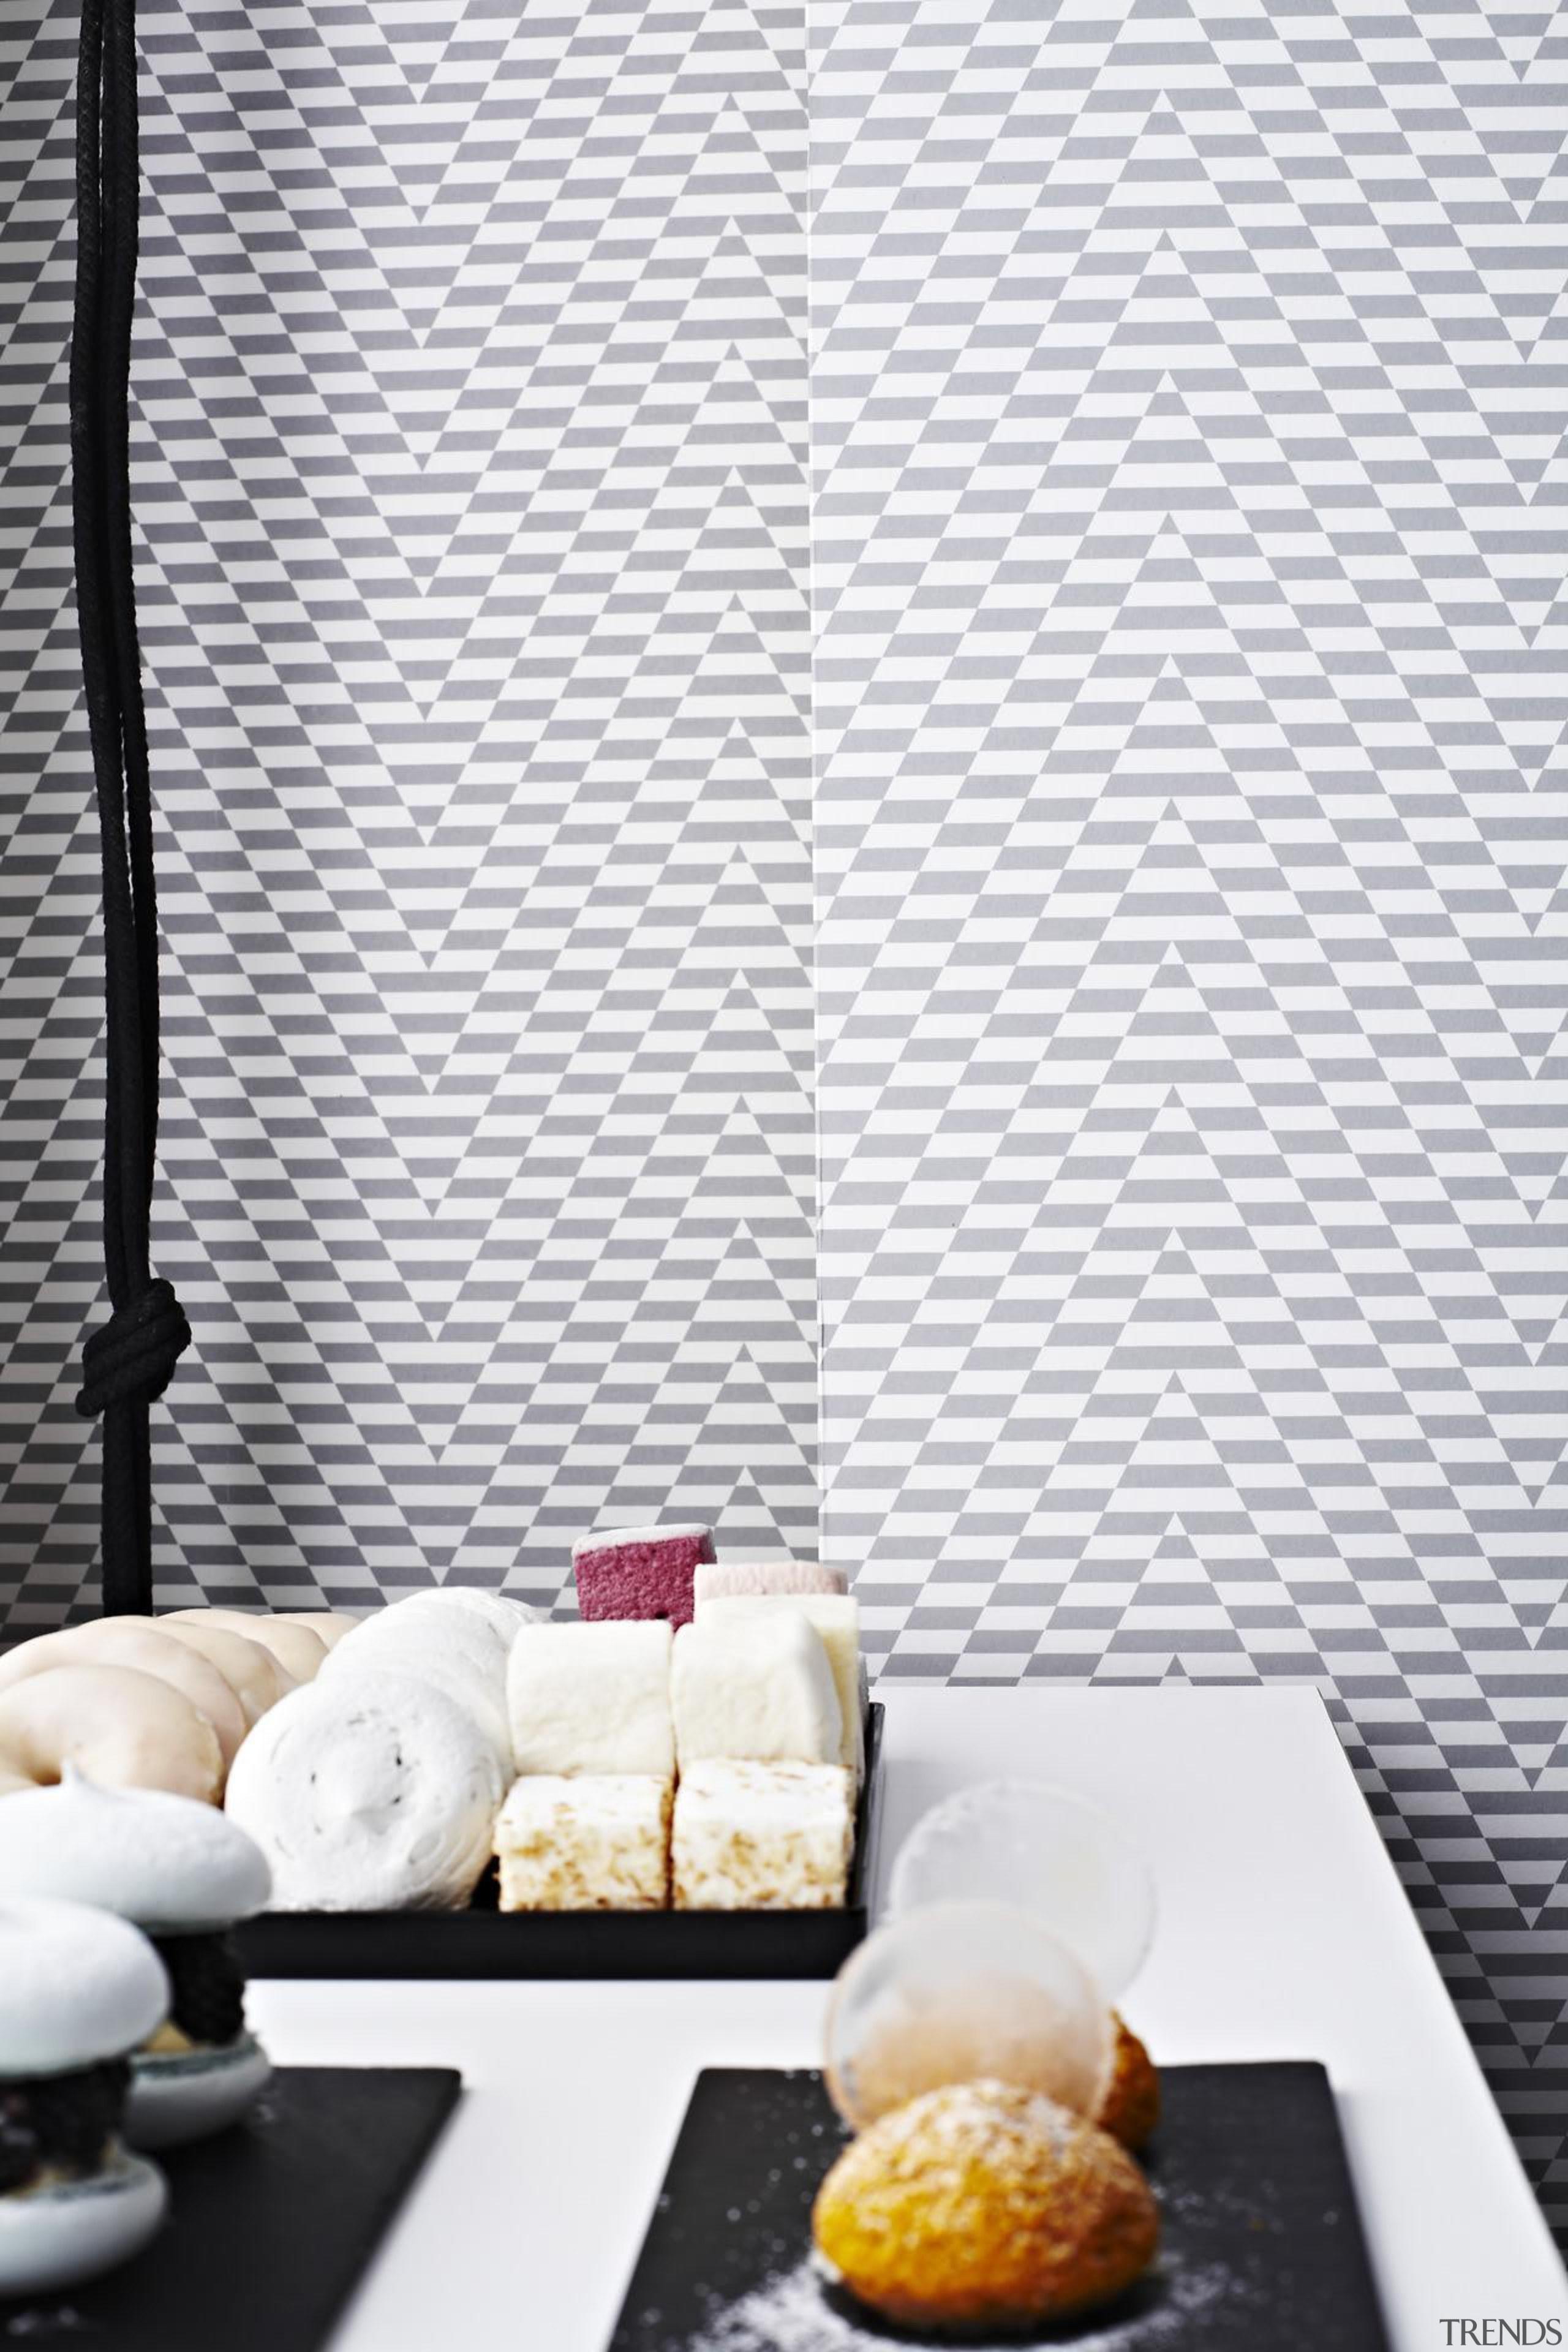 Eley Kishimoto Hand-Printed Wallpaper Collection - Eley Kishimoto interior design, table, wall, wallpaper, white